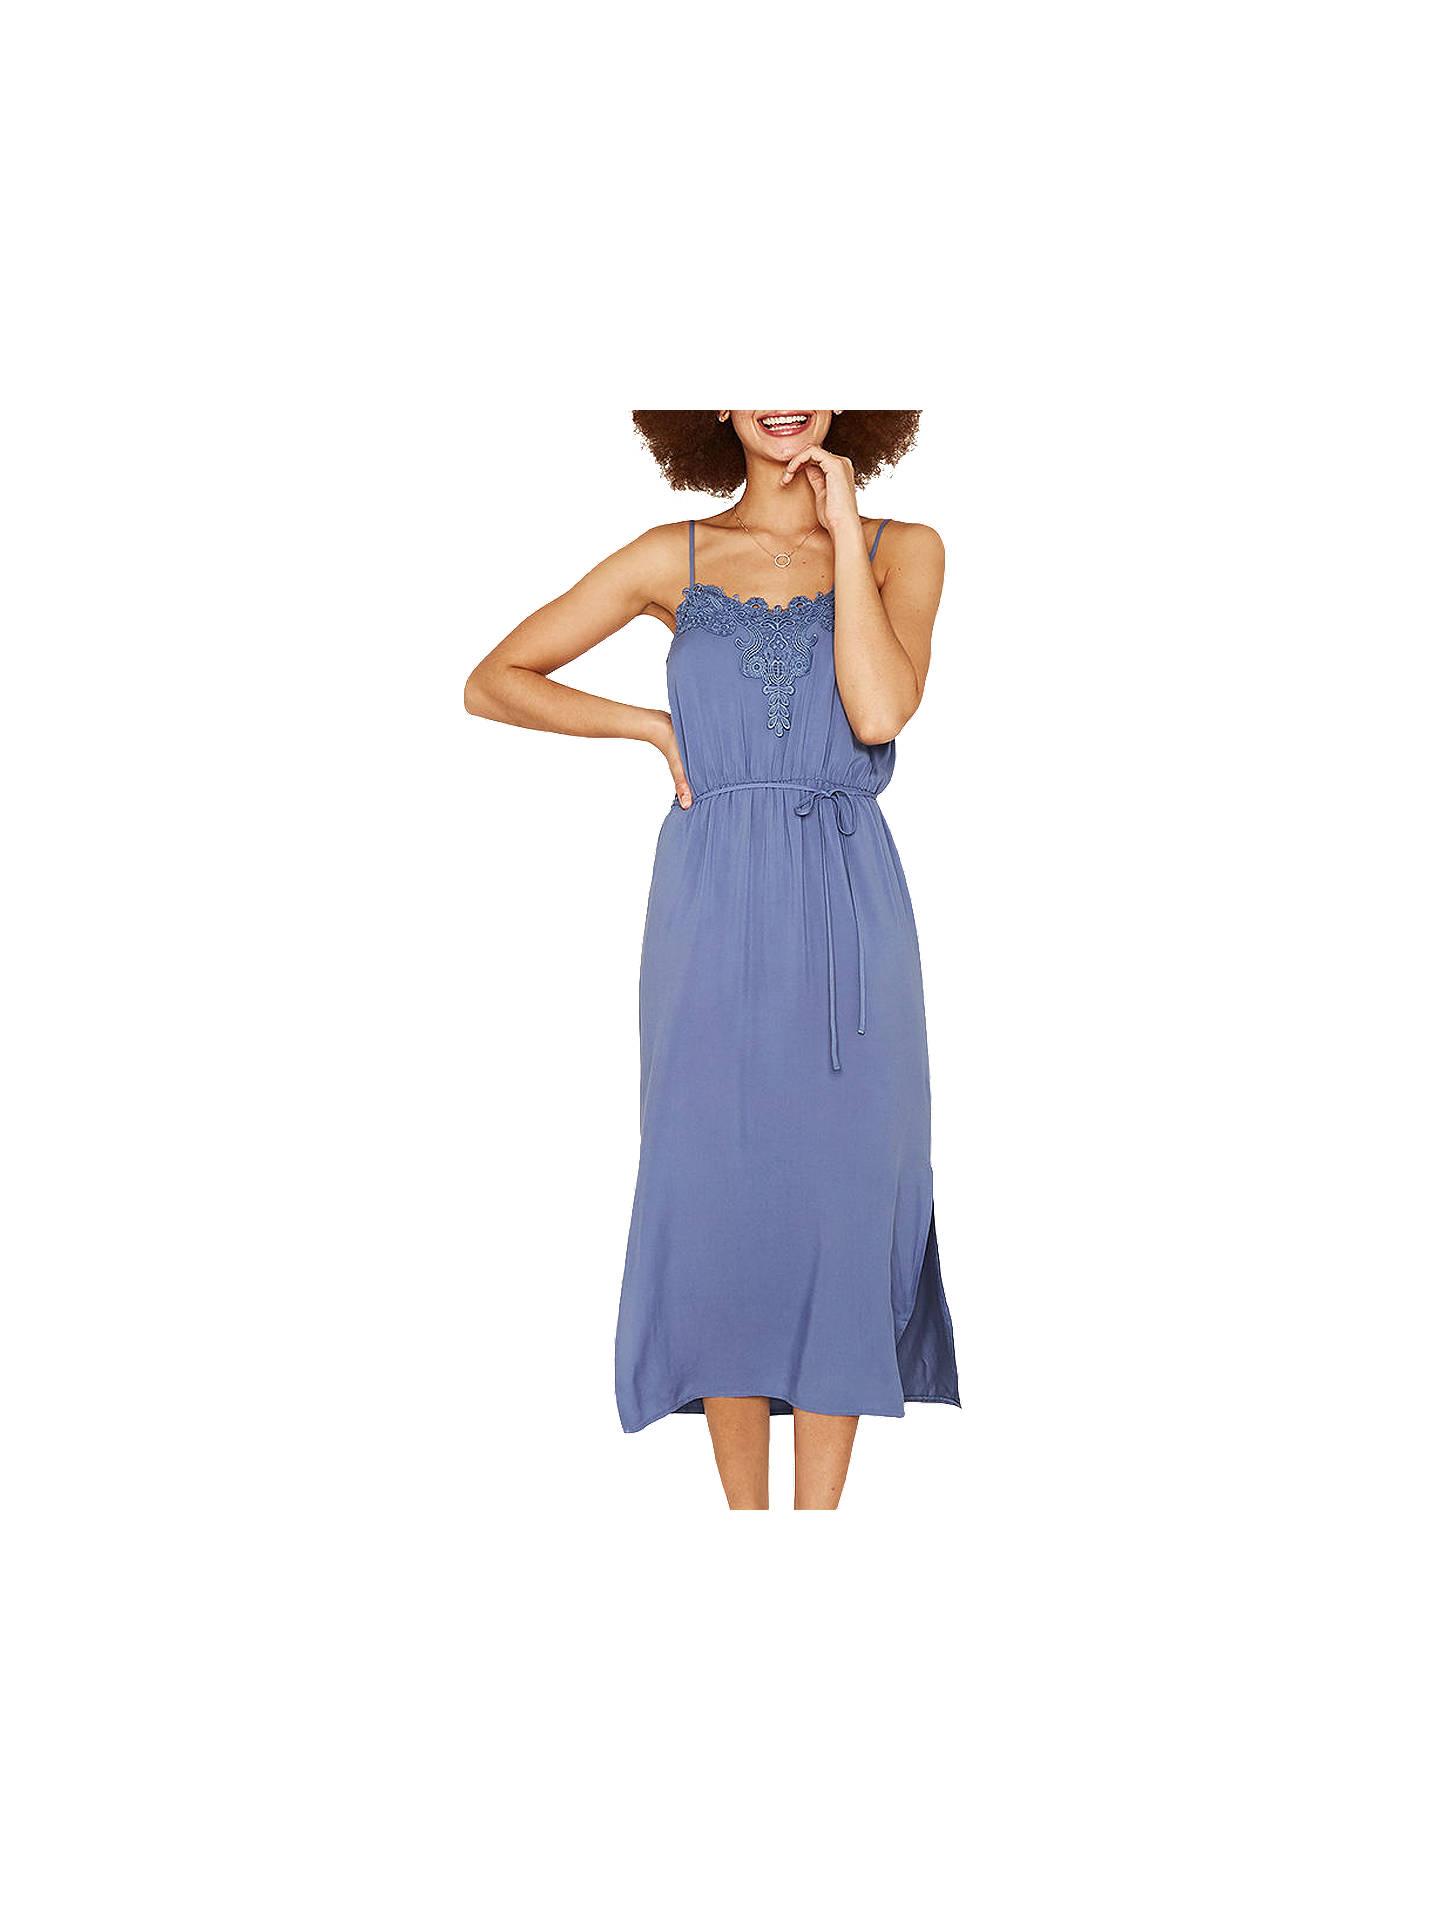 7babfd1dfe82 Buy Oasis Lace Trim Midi Dress, Mid Blue, 6 Online at johnlewis.com ...